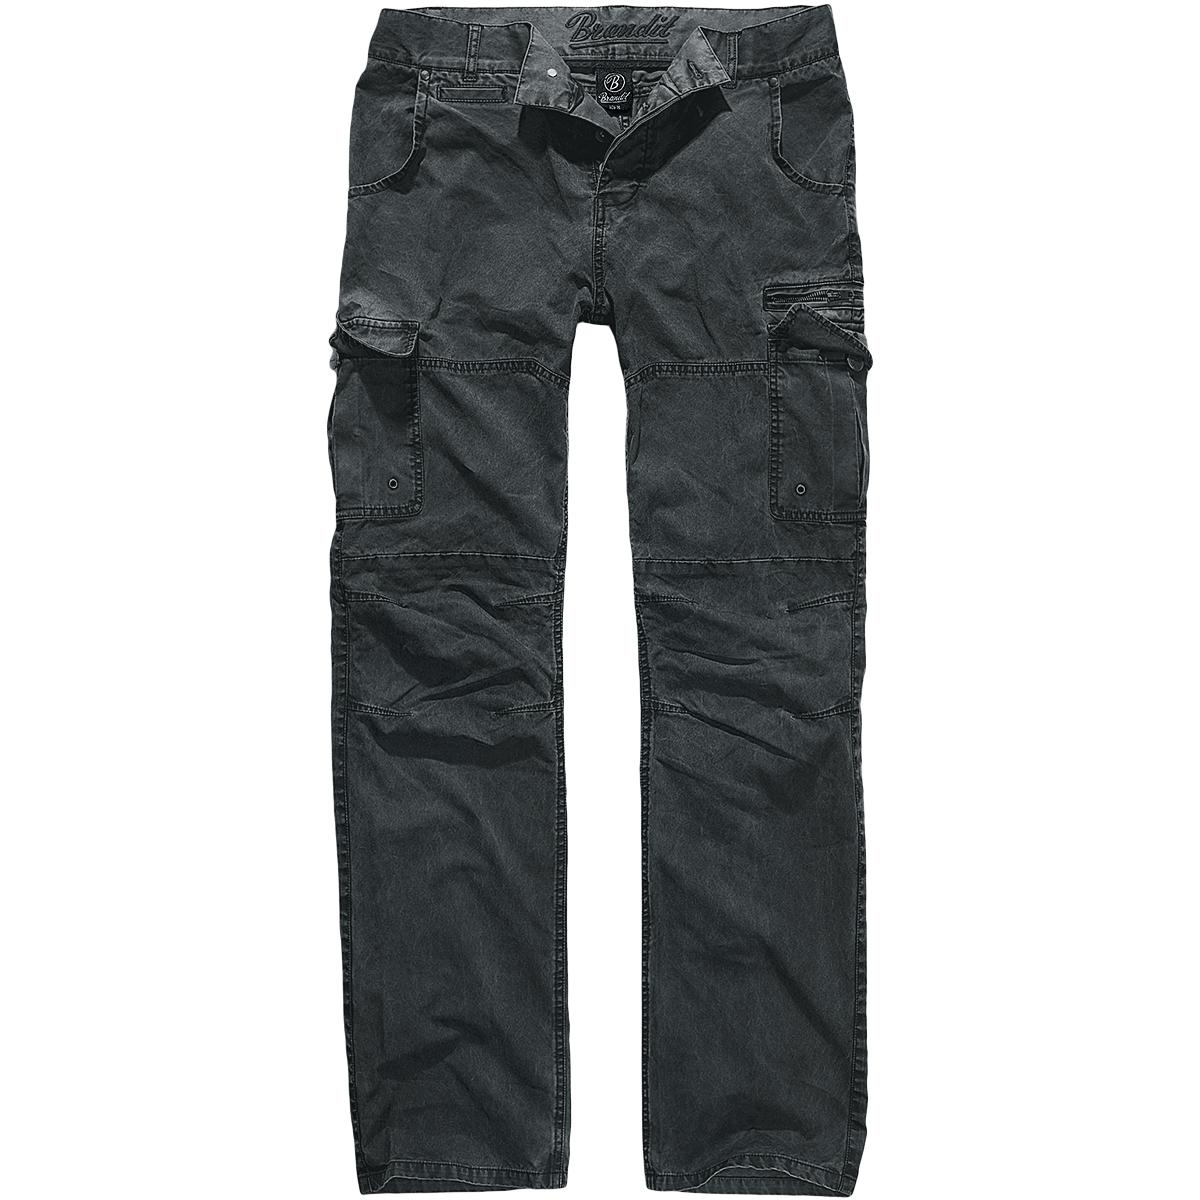 Black Cargo Work Pants